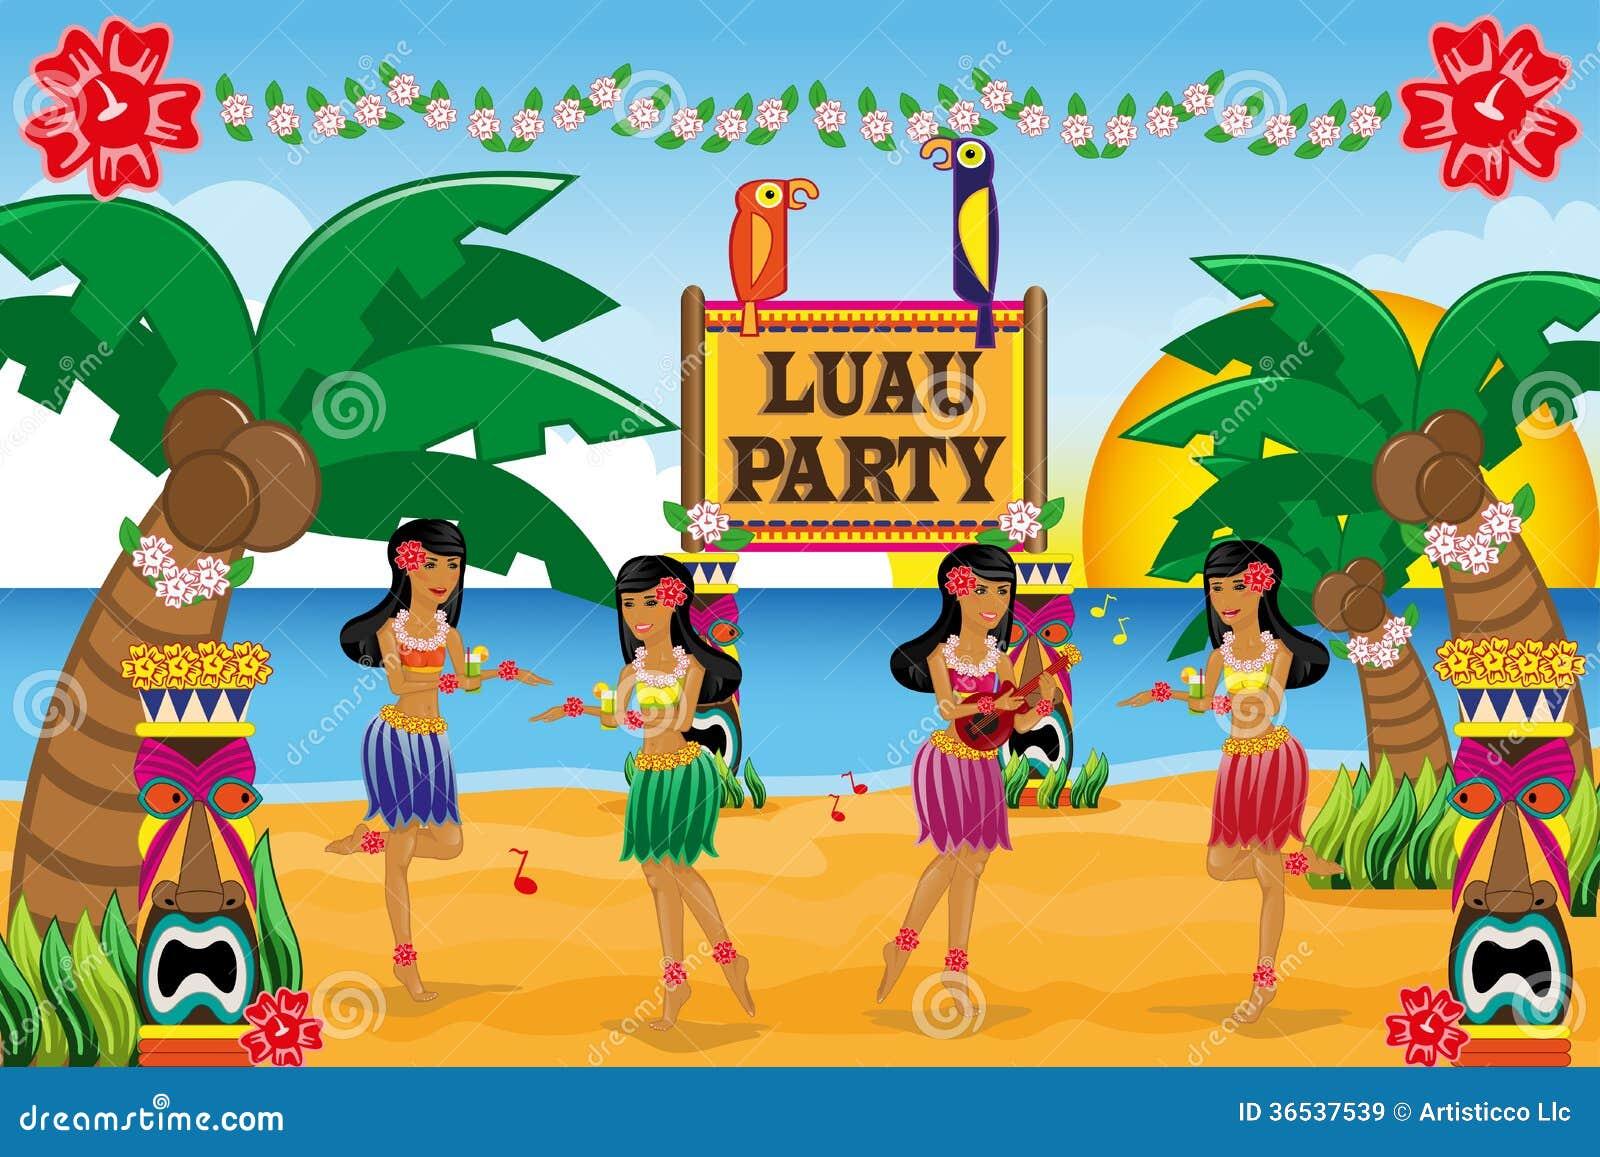 Hawaiian Invitation Cards with good invitation sample